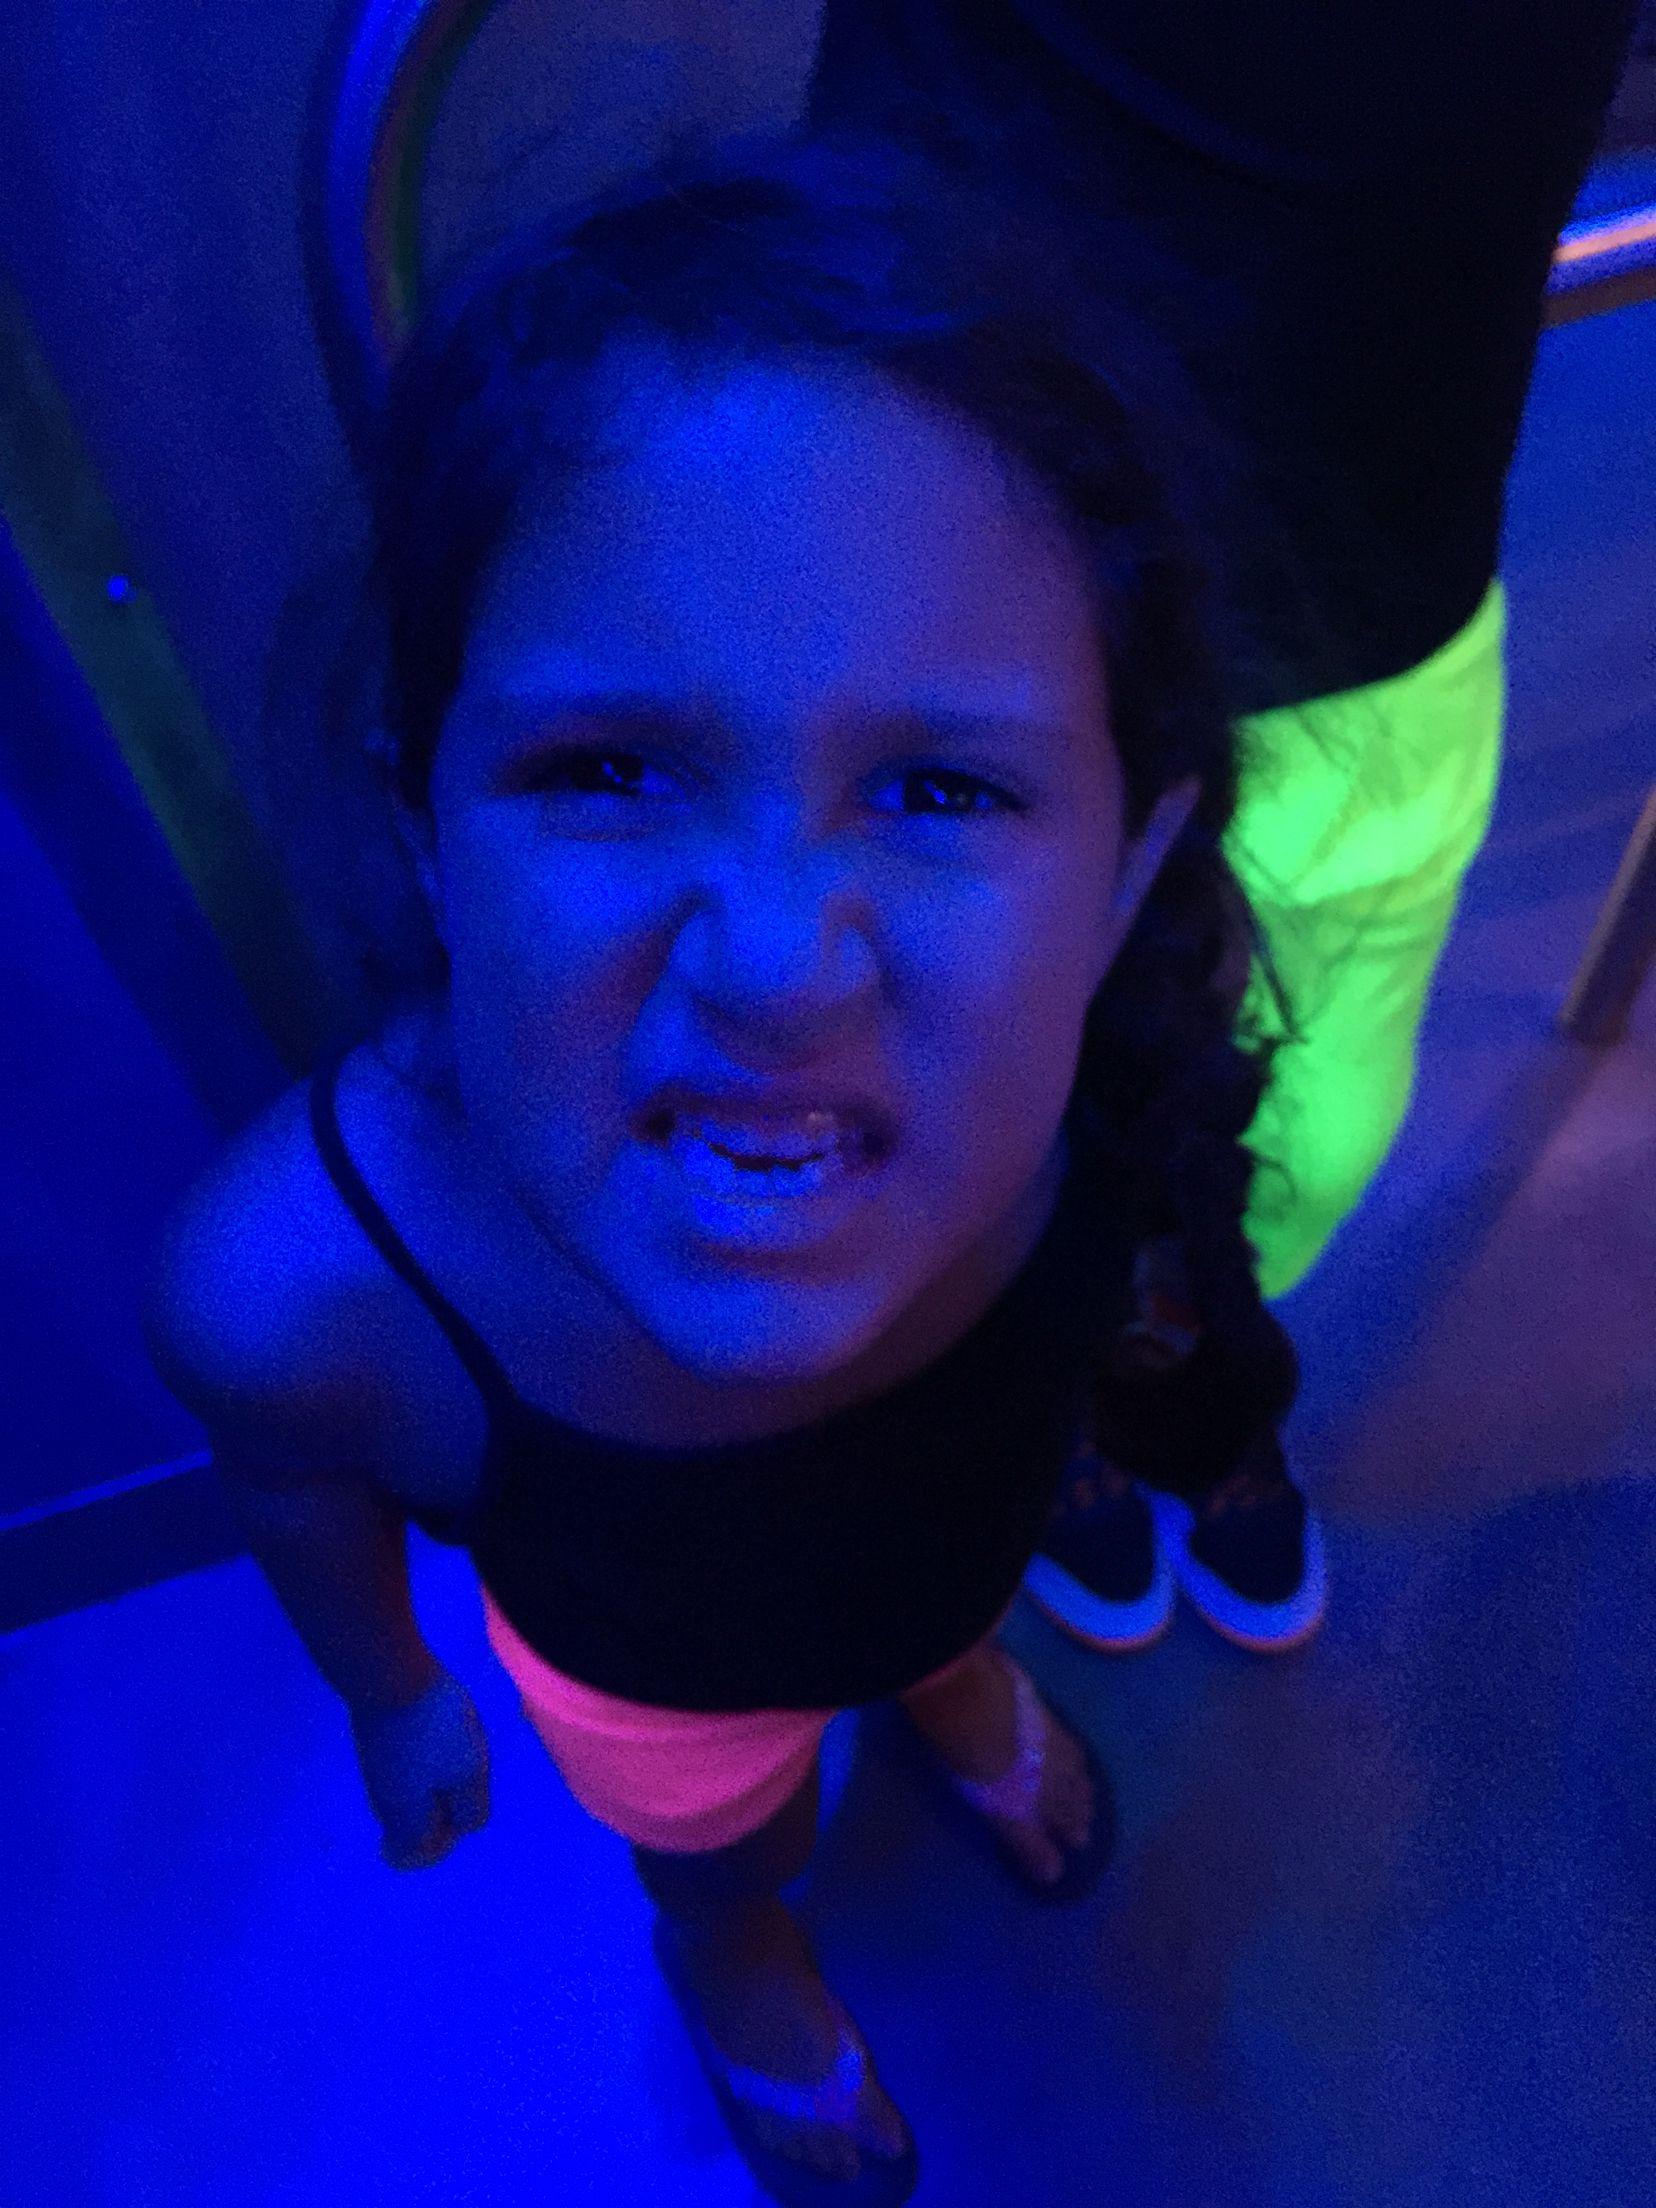 Crazy daughter!